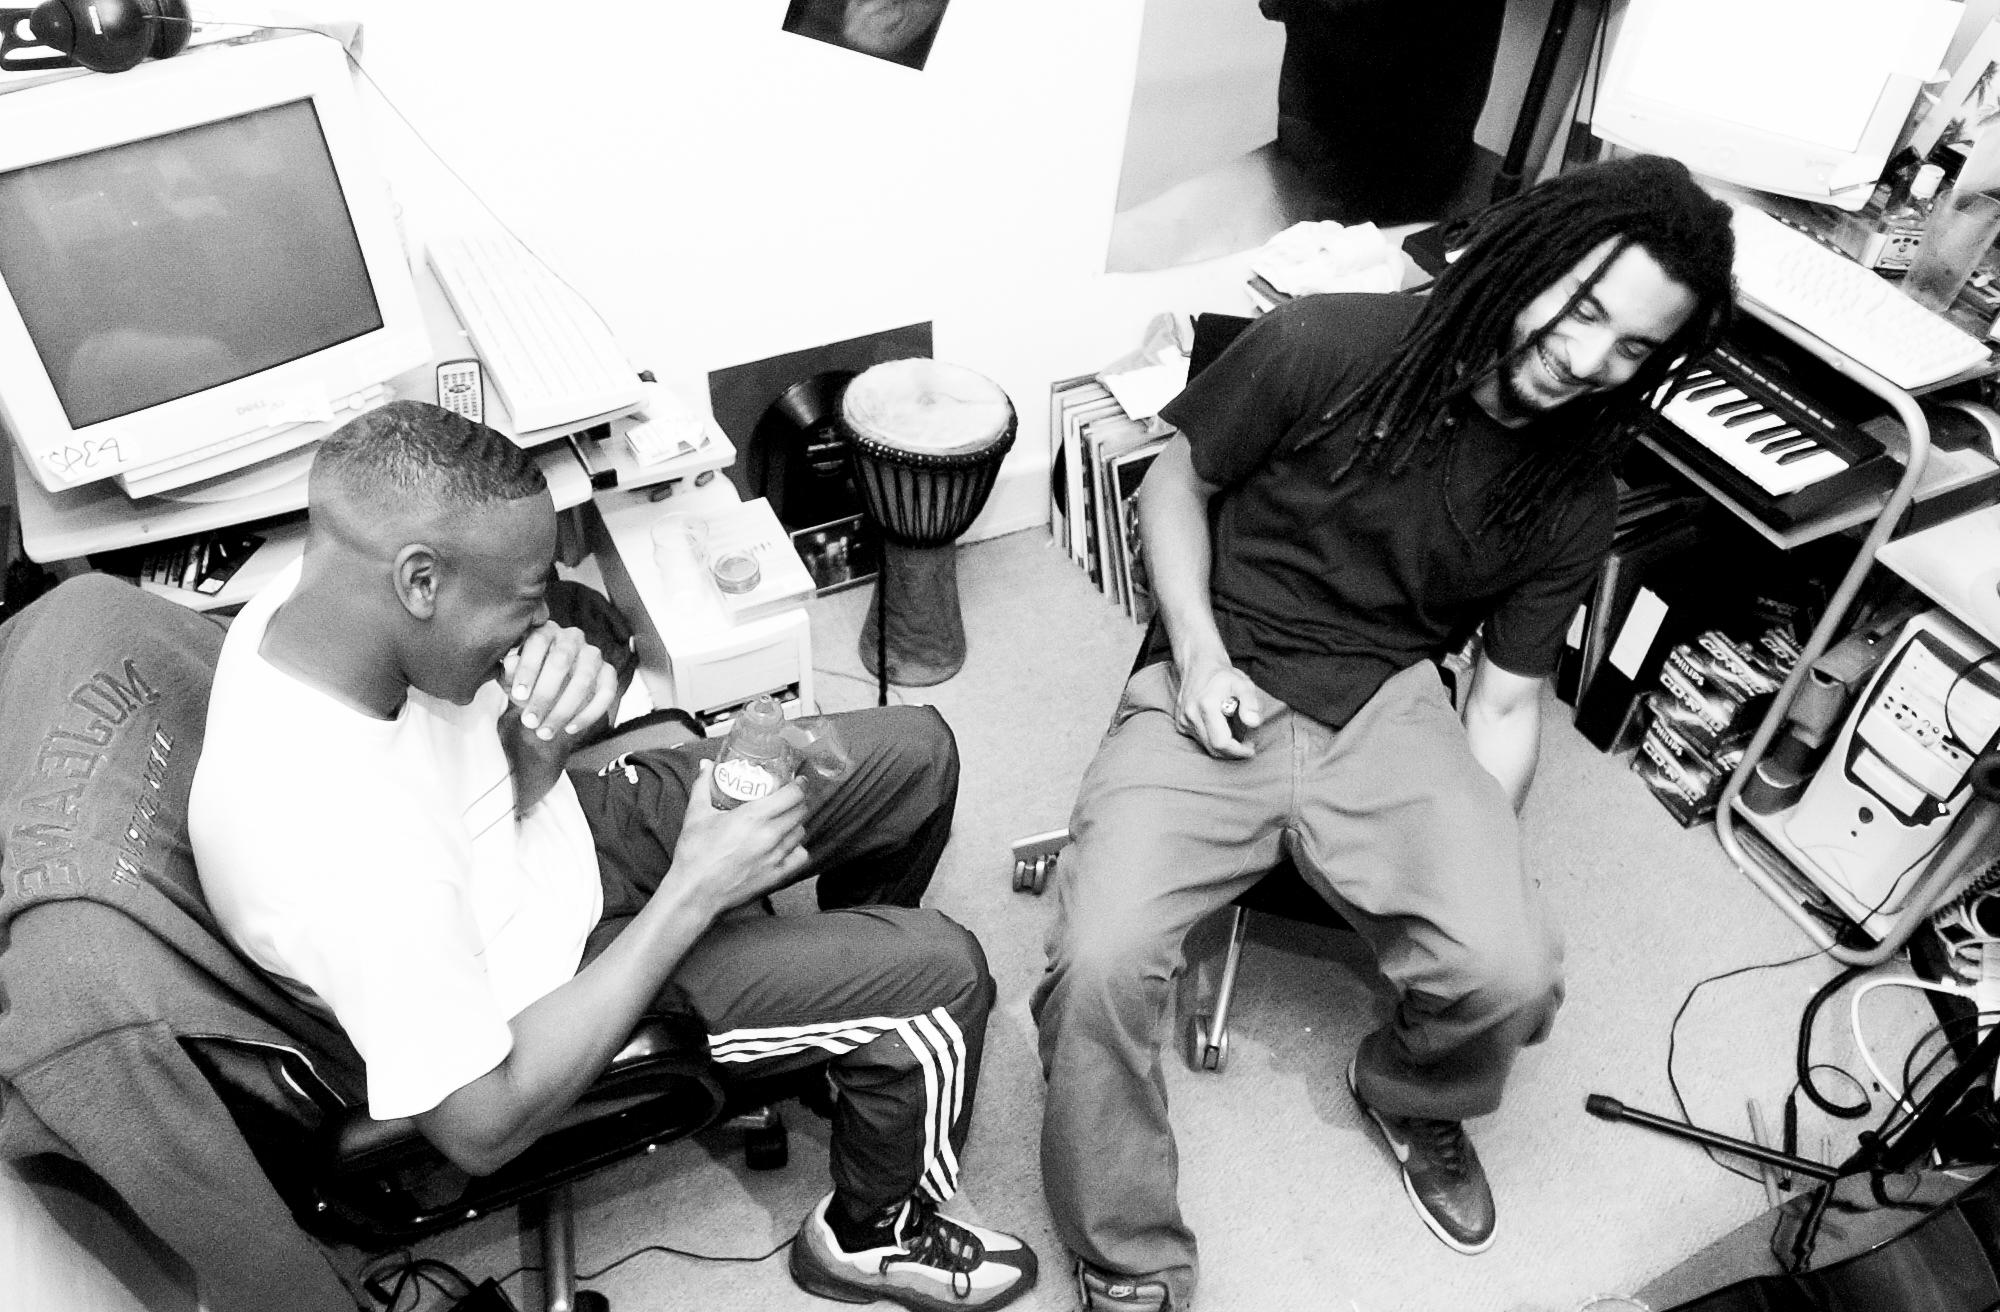 DIGITAL MYSTIKZ IN THE STUDIO, CROYDON, 2004